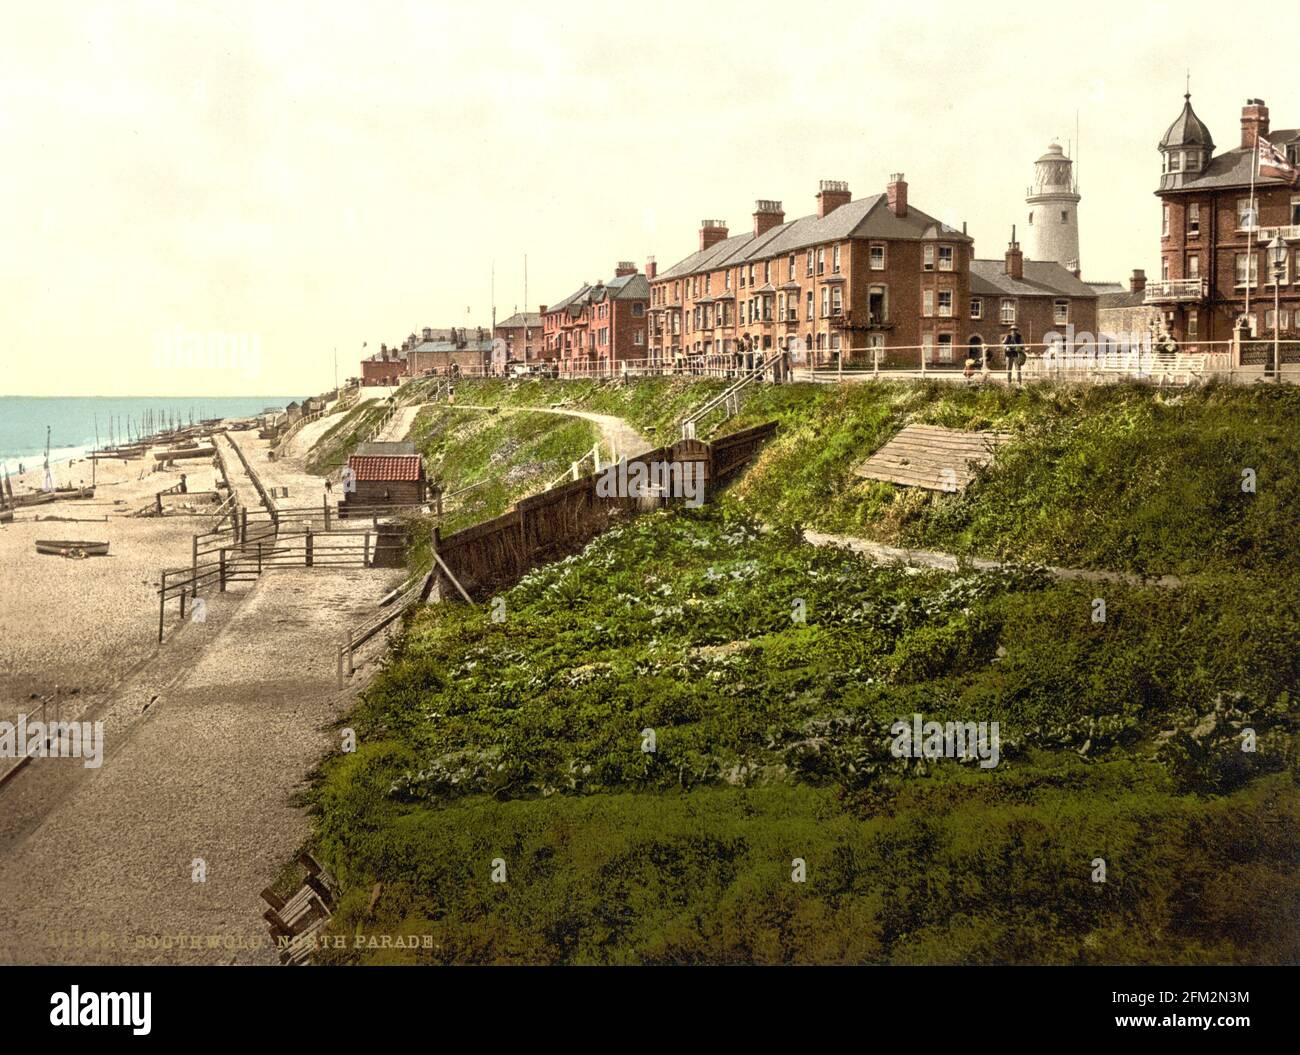 North Parade, bord de mer de Southwold, Suffolk, vers 1890-1900 Banque D'Images